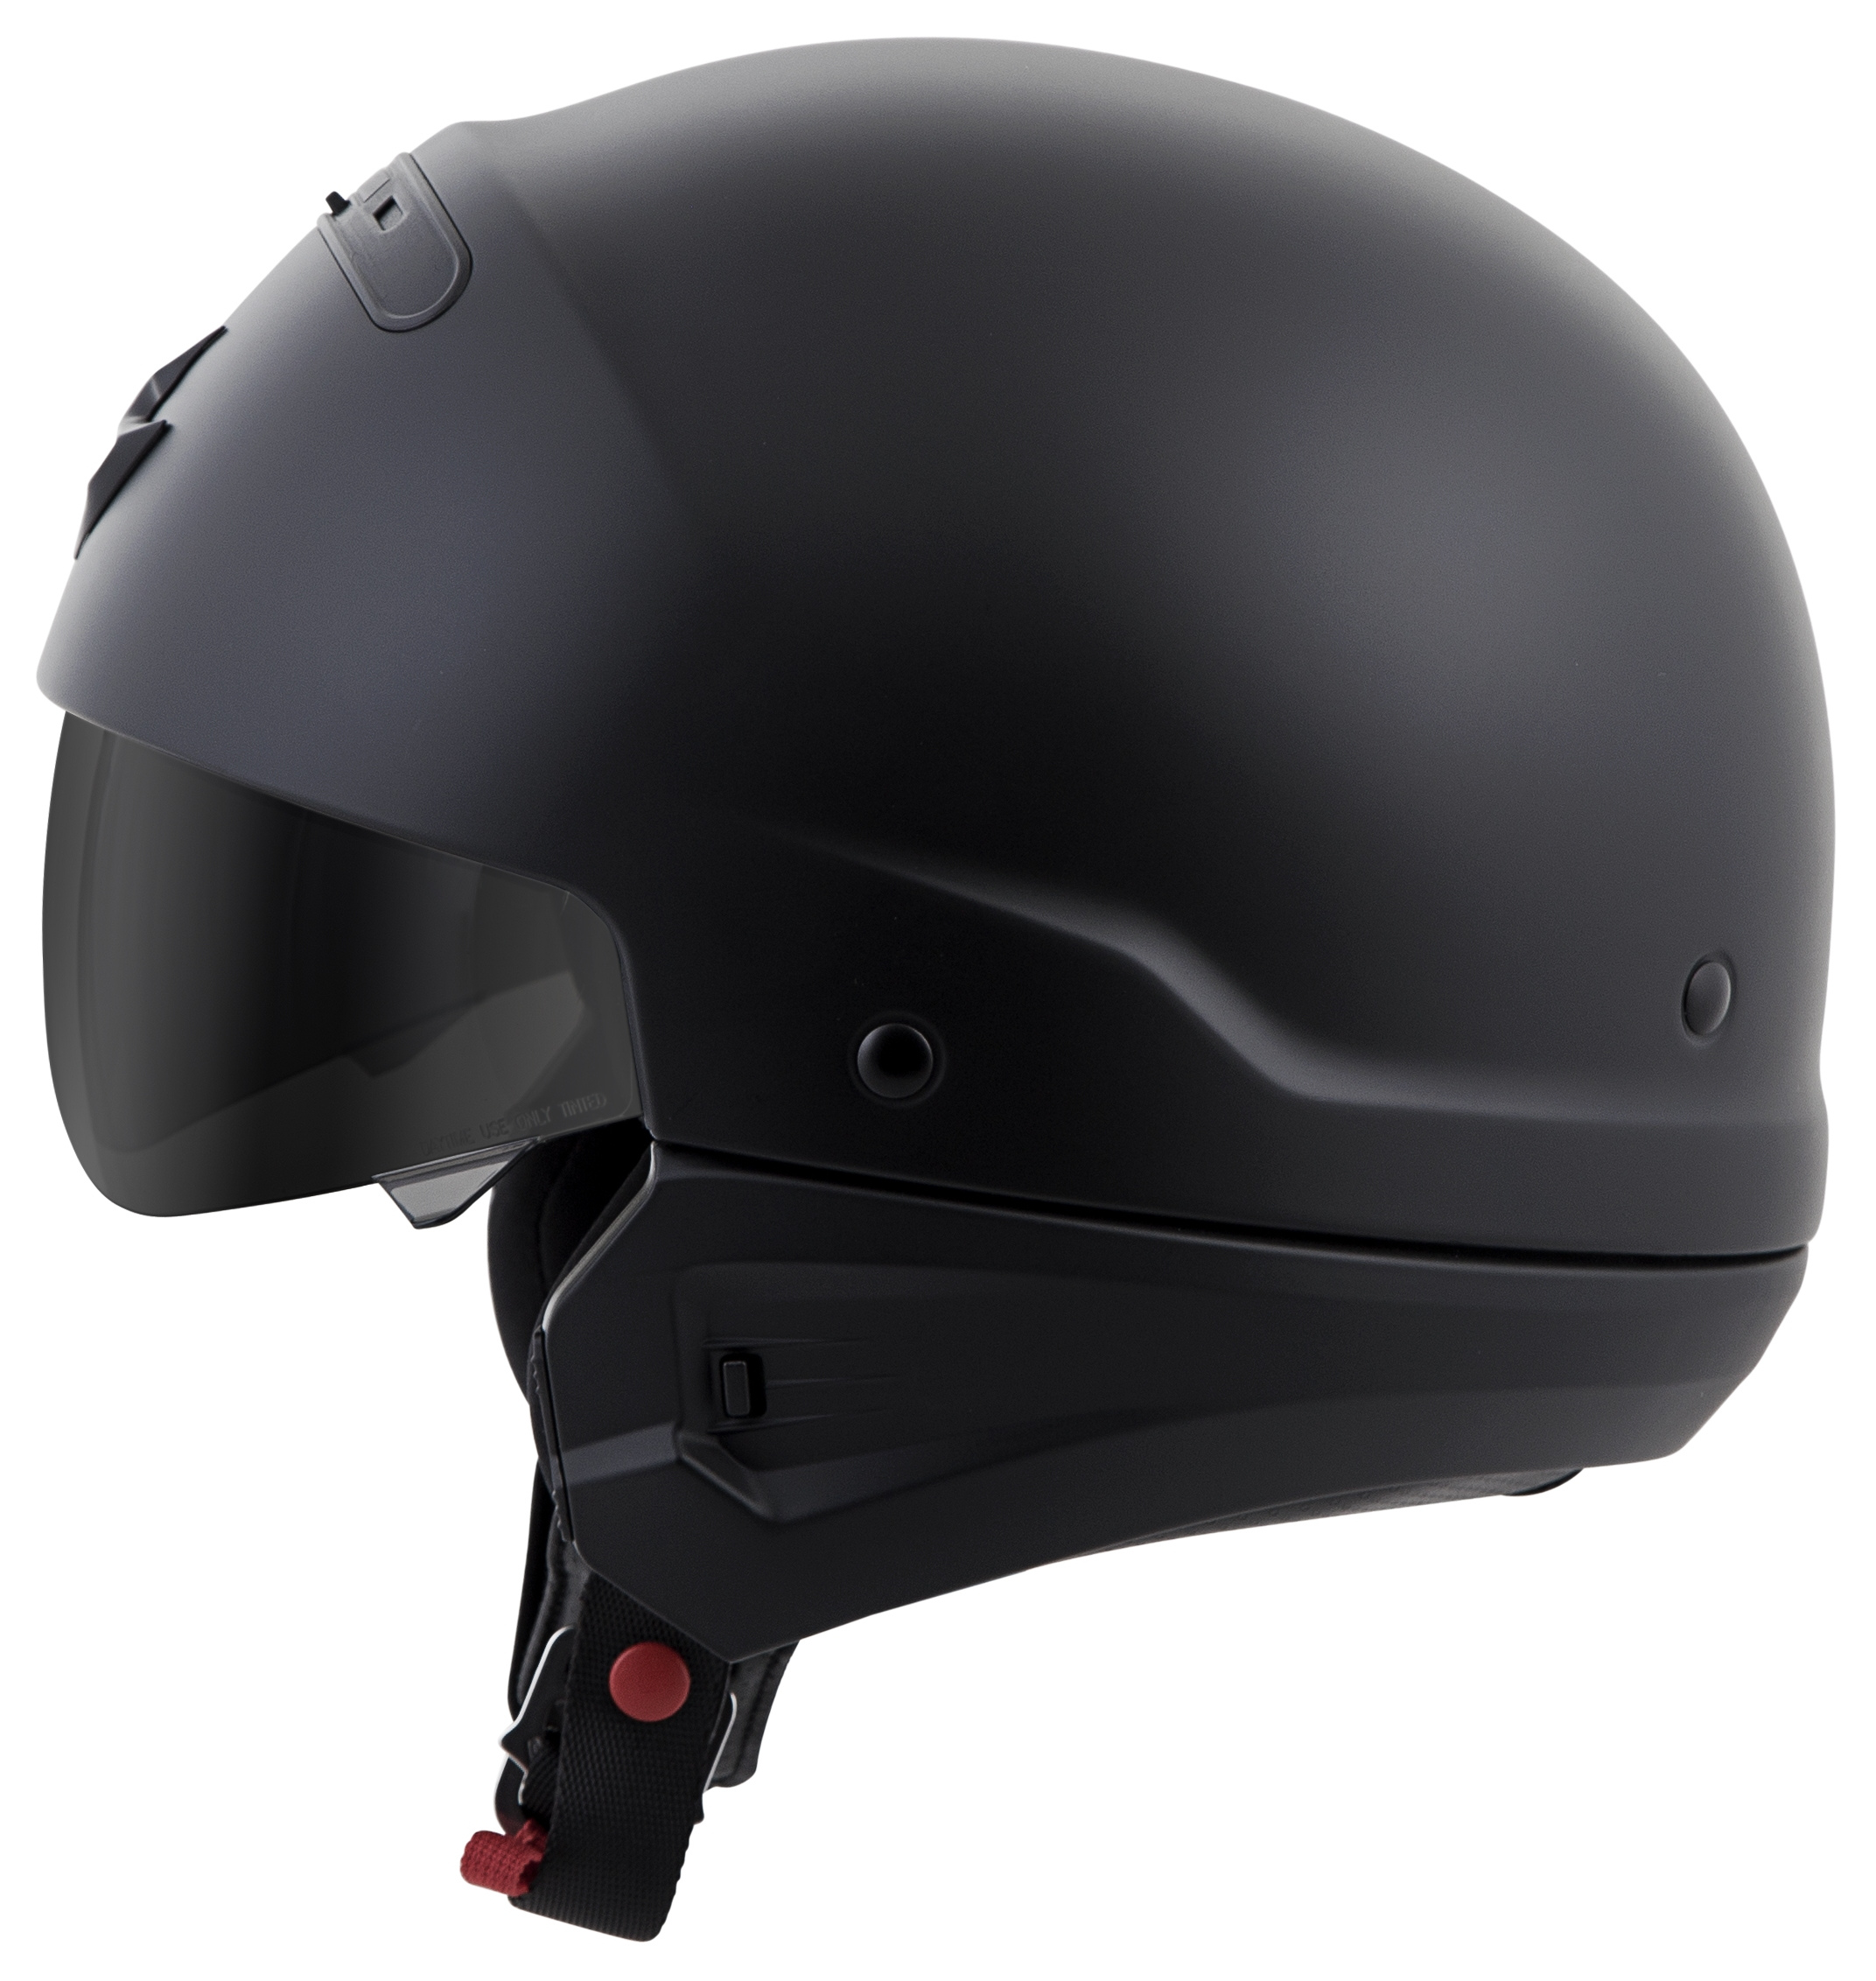 d97bbbb8 Scorpion Covert Helmet - RevZilla